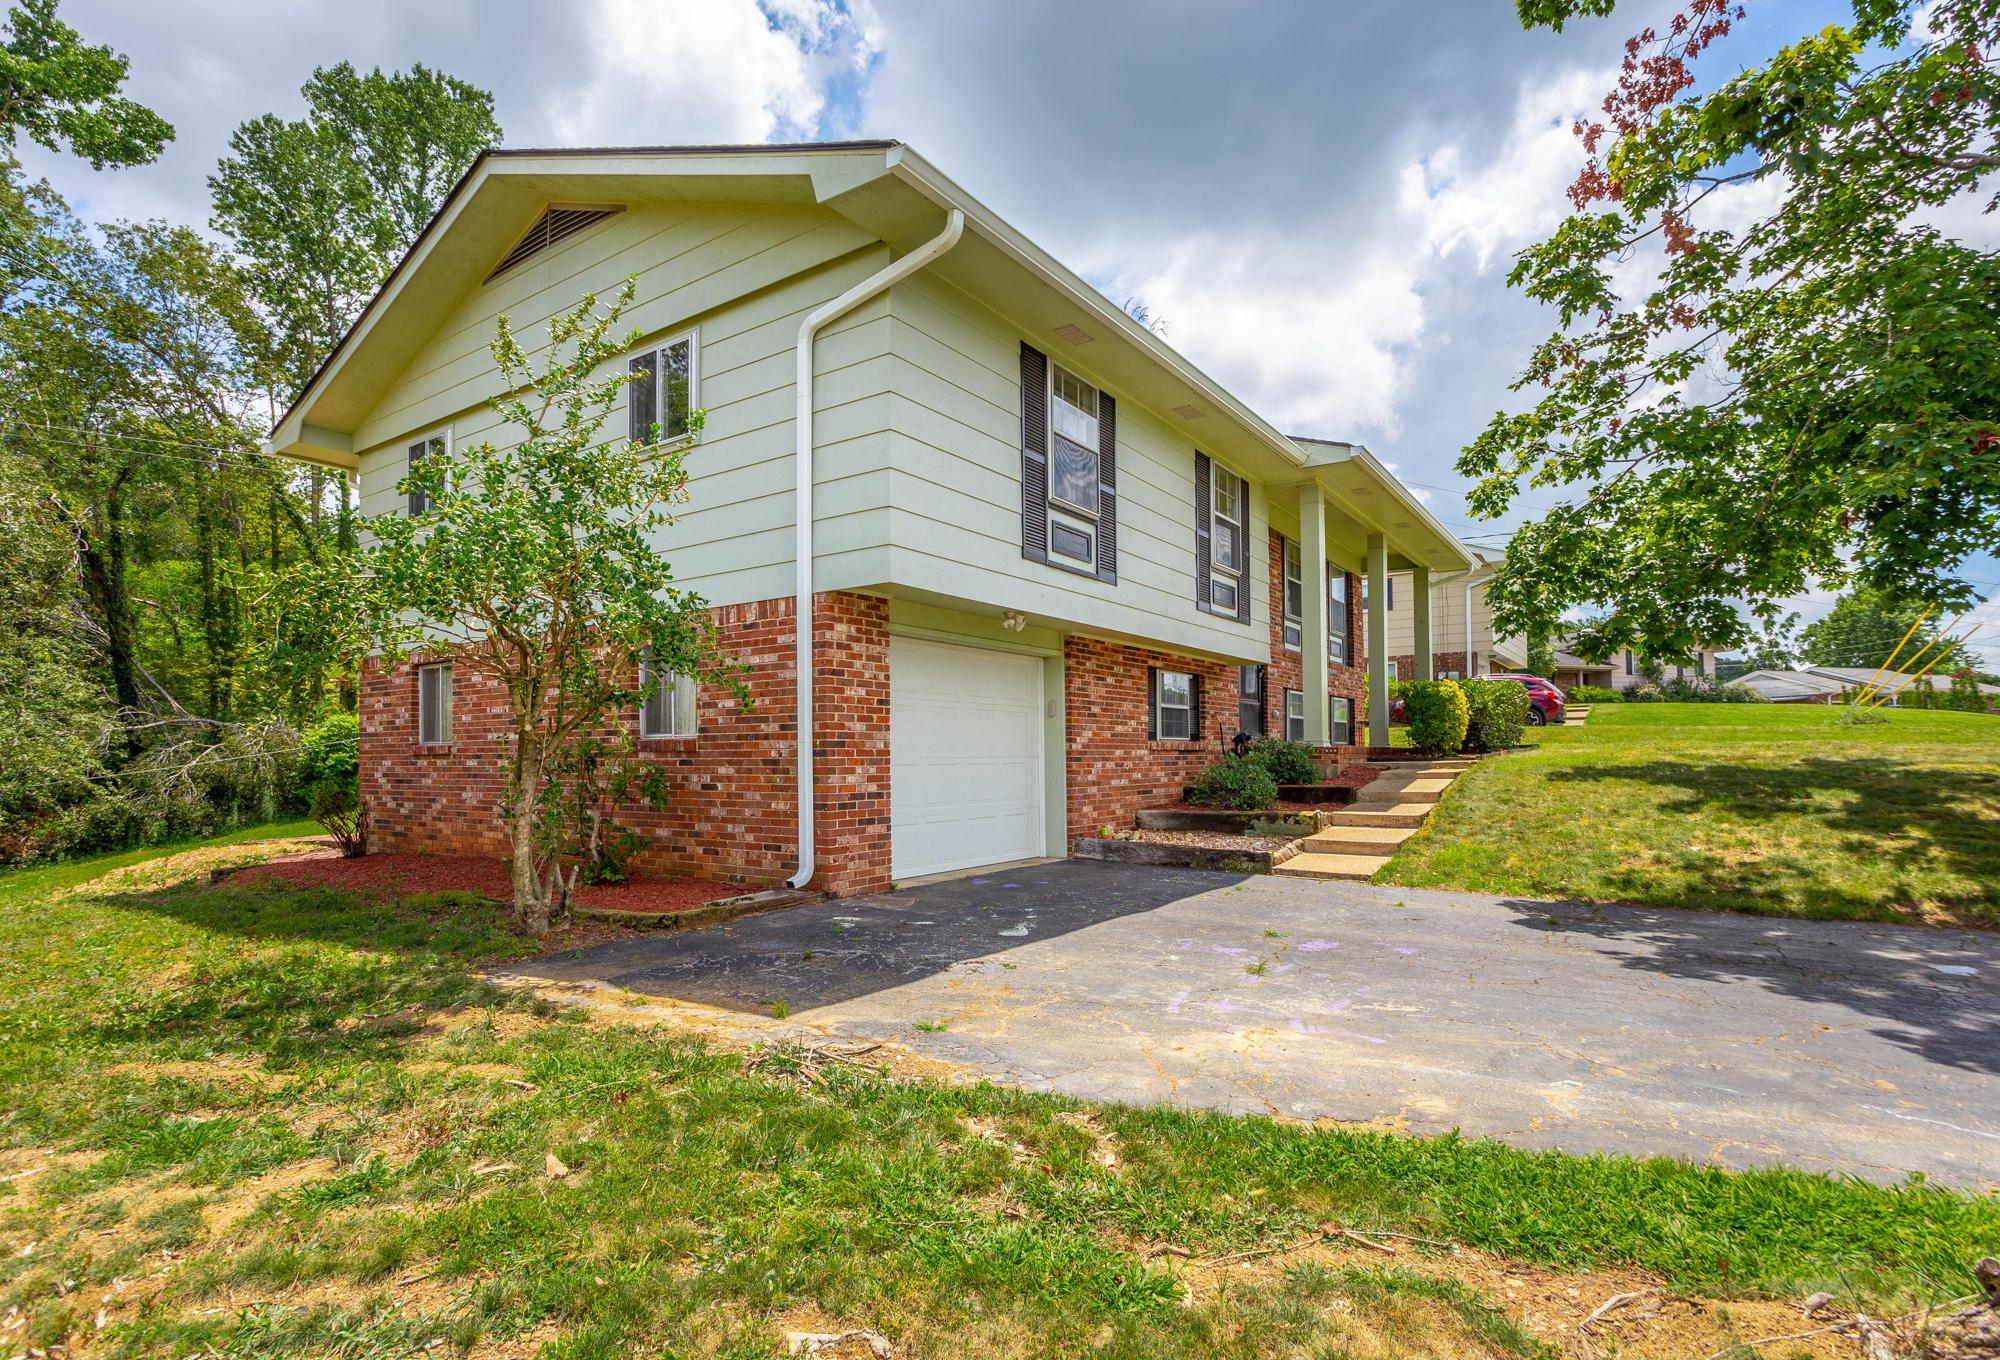 2412 Corral Tr, Chattanooga, TN 37421